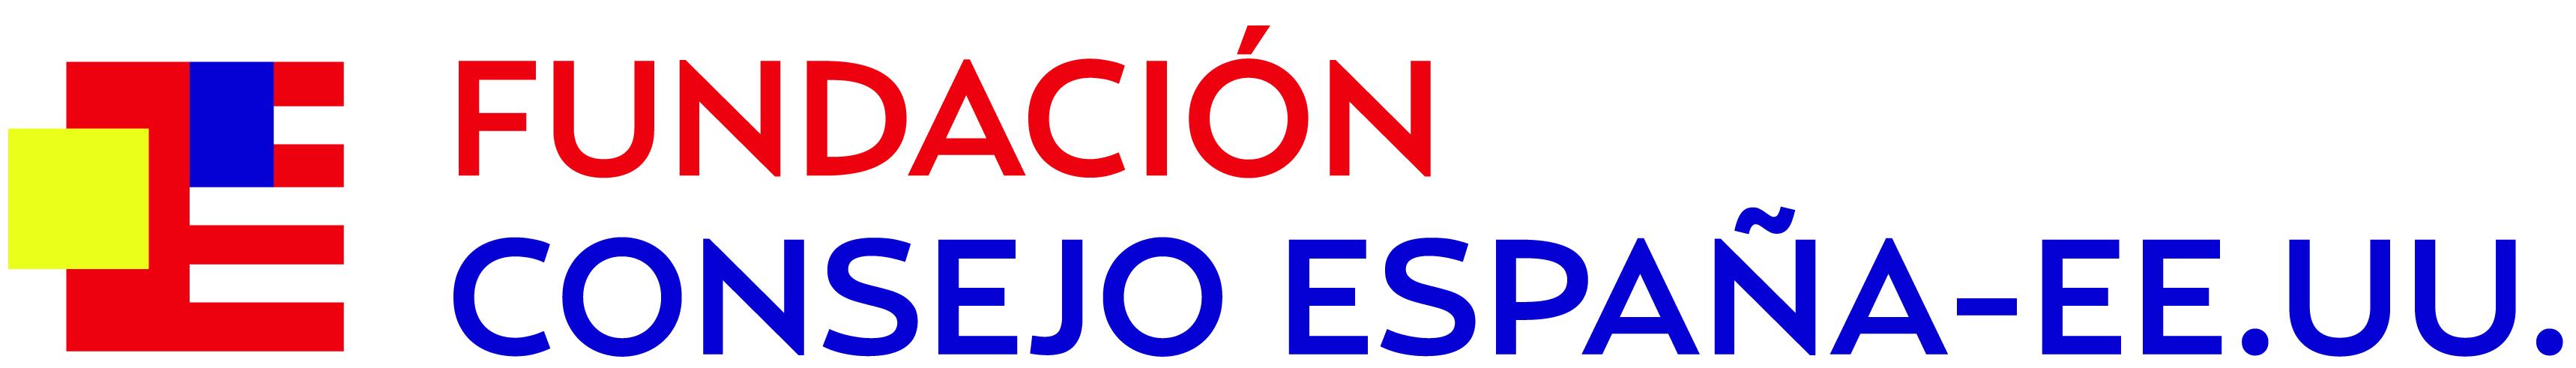 LOGO NUEVO FUNDACION CONSEJO ESPANA EEUU